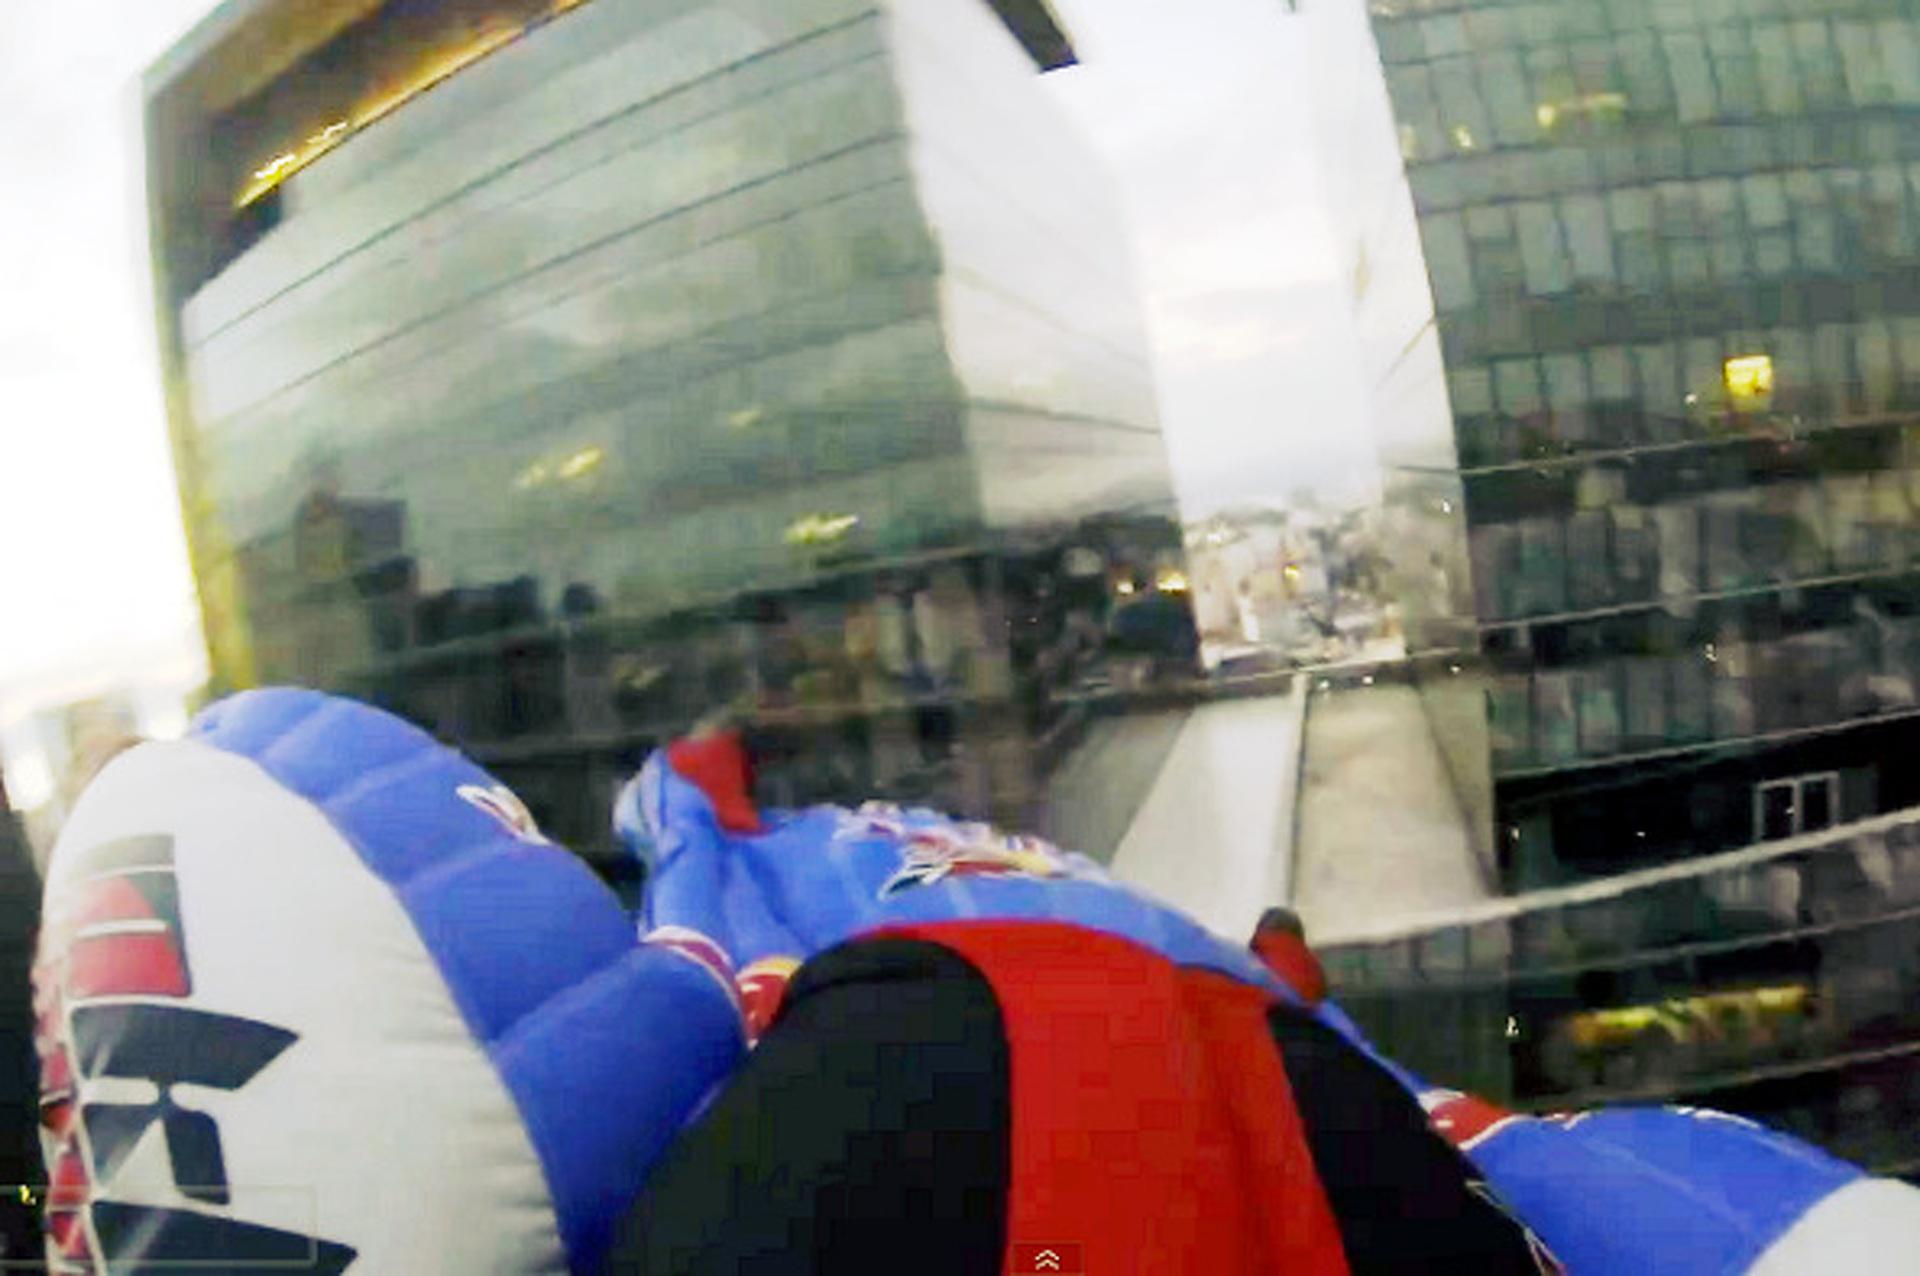 Video: Red Bull Wingsuiters Fly Amongst Buildings in Rio